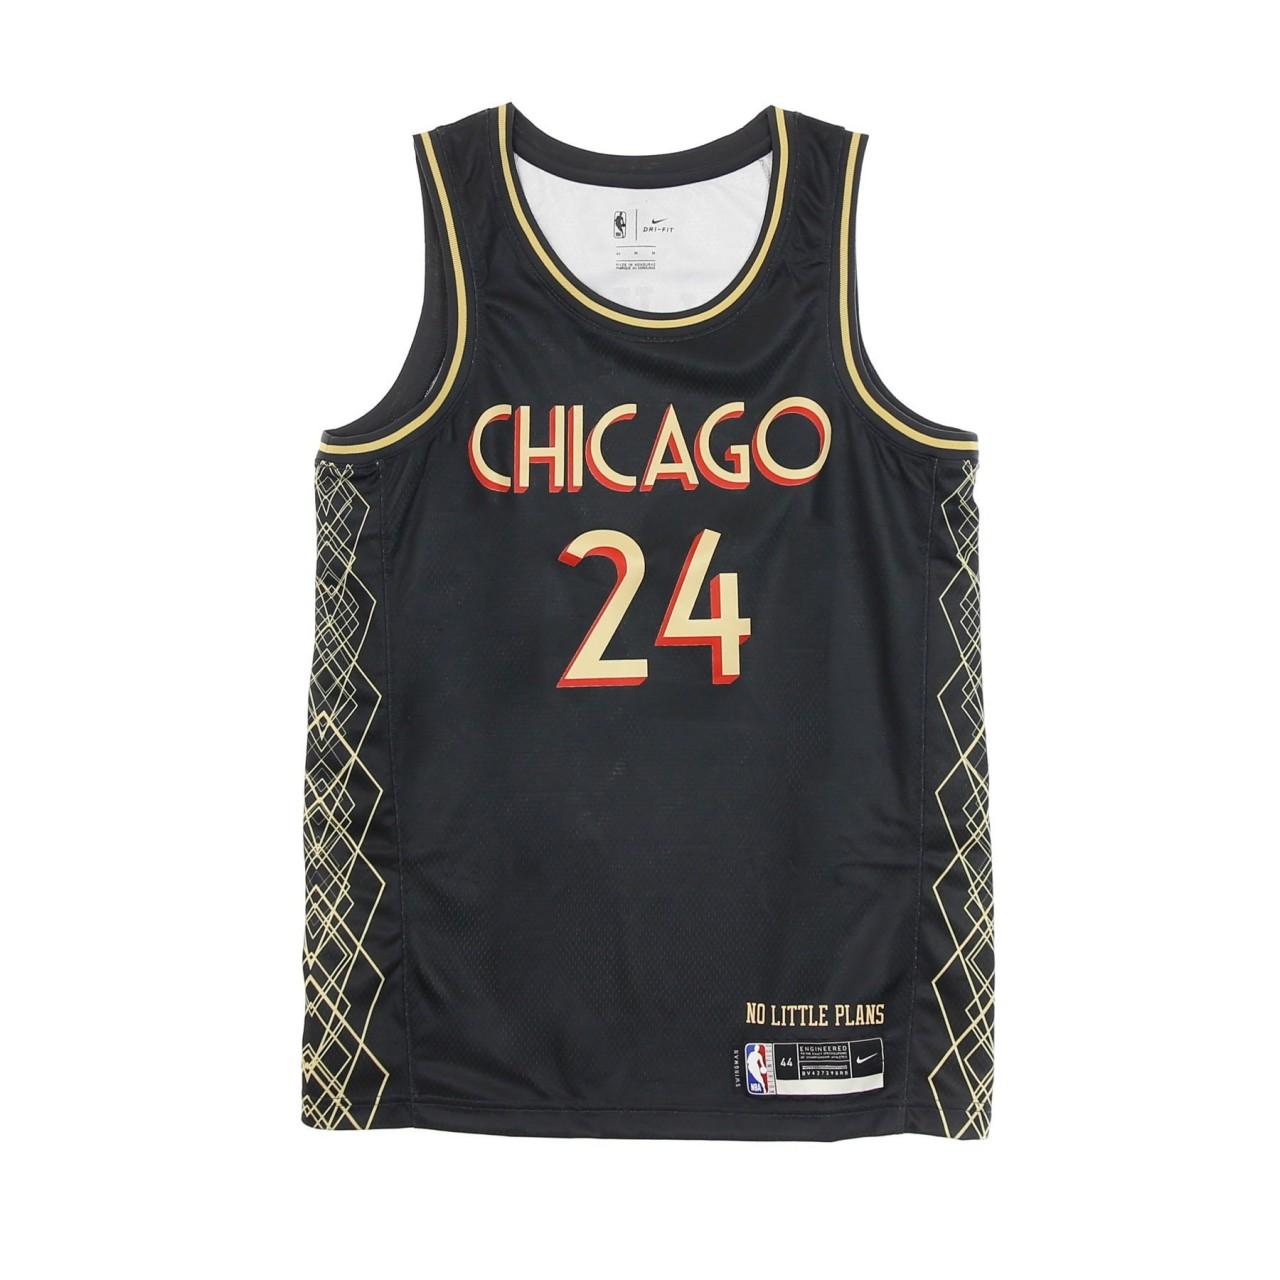 NIKE NBA NBA SWINGMAN JERSEY CITY EDITION 2020 N 24 LAURI MARKKANEN CHIBUL CN1719-065